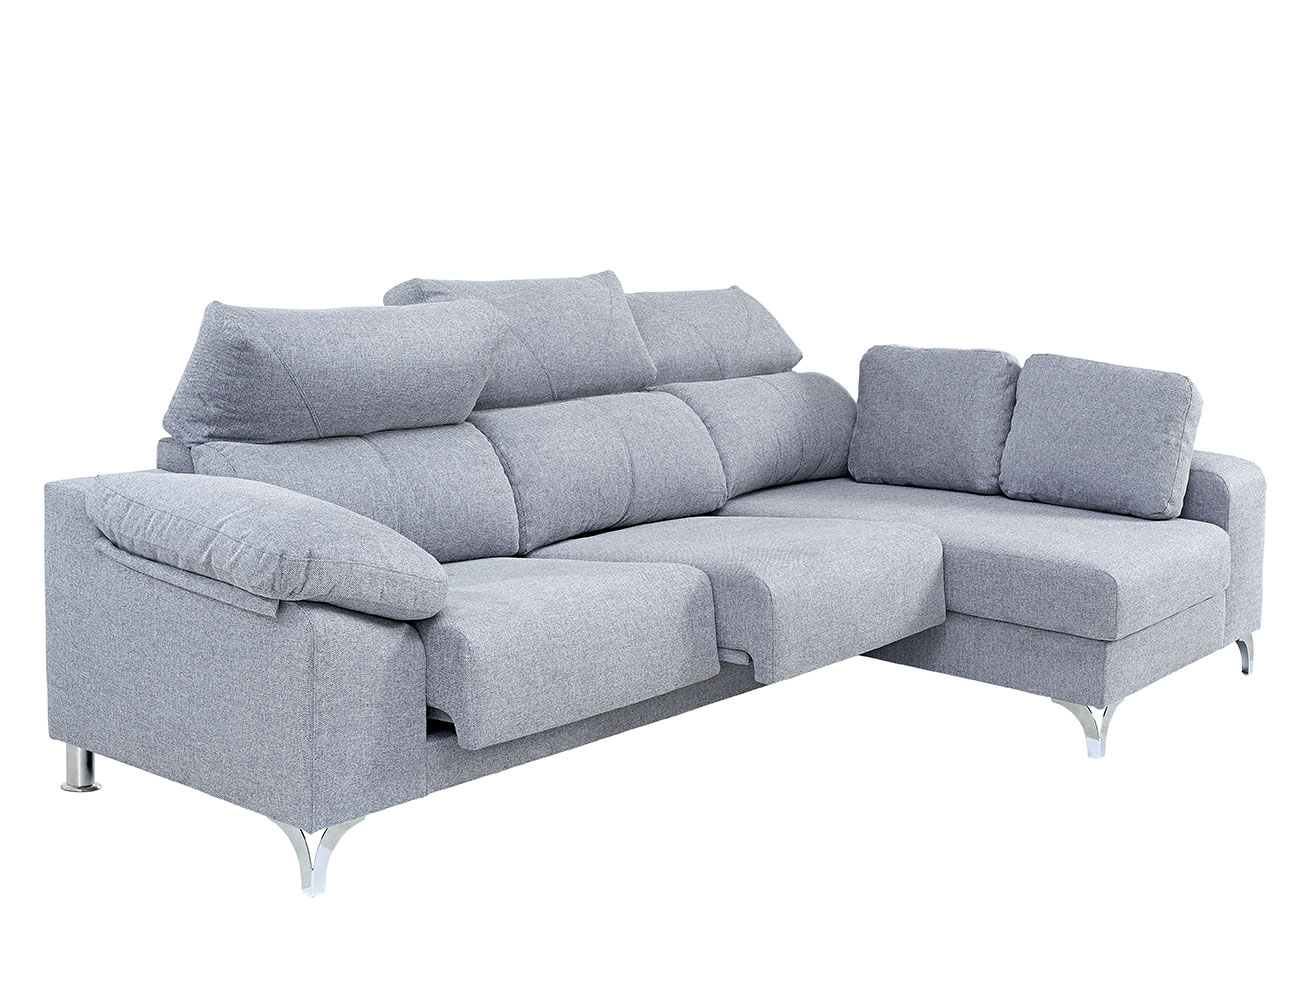 Sofa cuba detalle